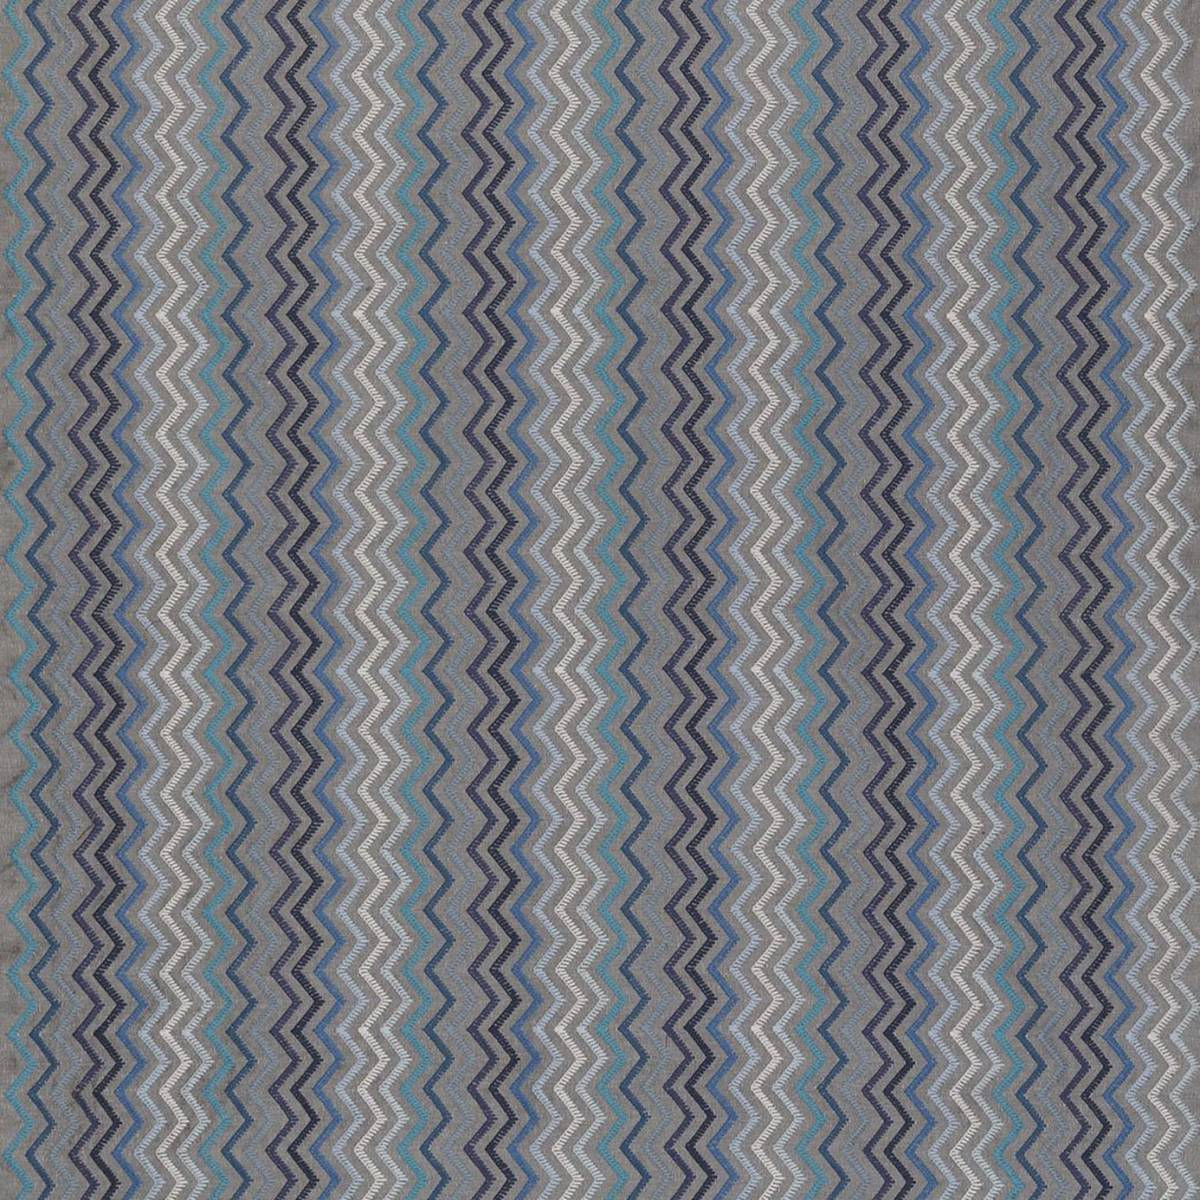 Taggia Fabric - Indigo / Azure (F7174-02) - Osborne & Little ...